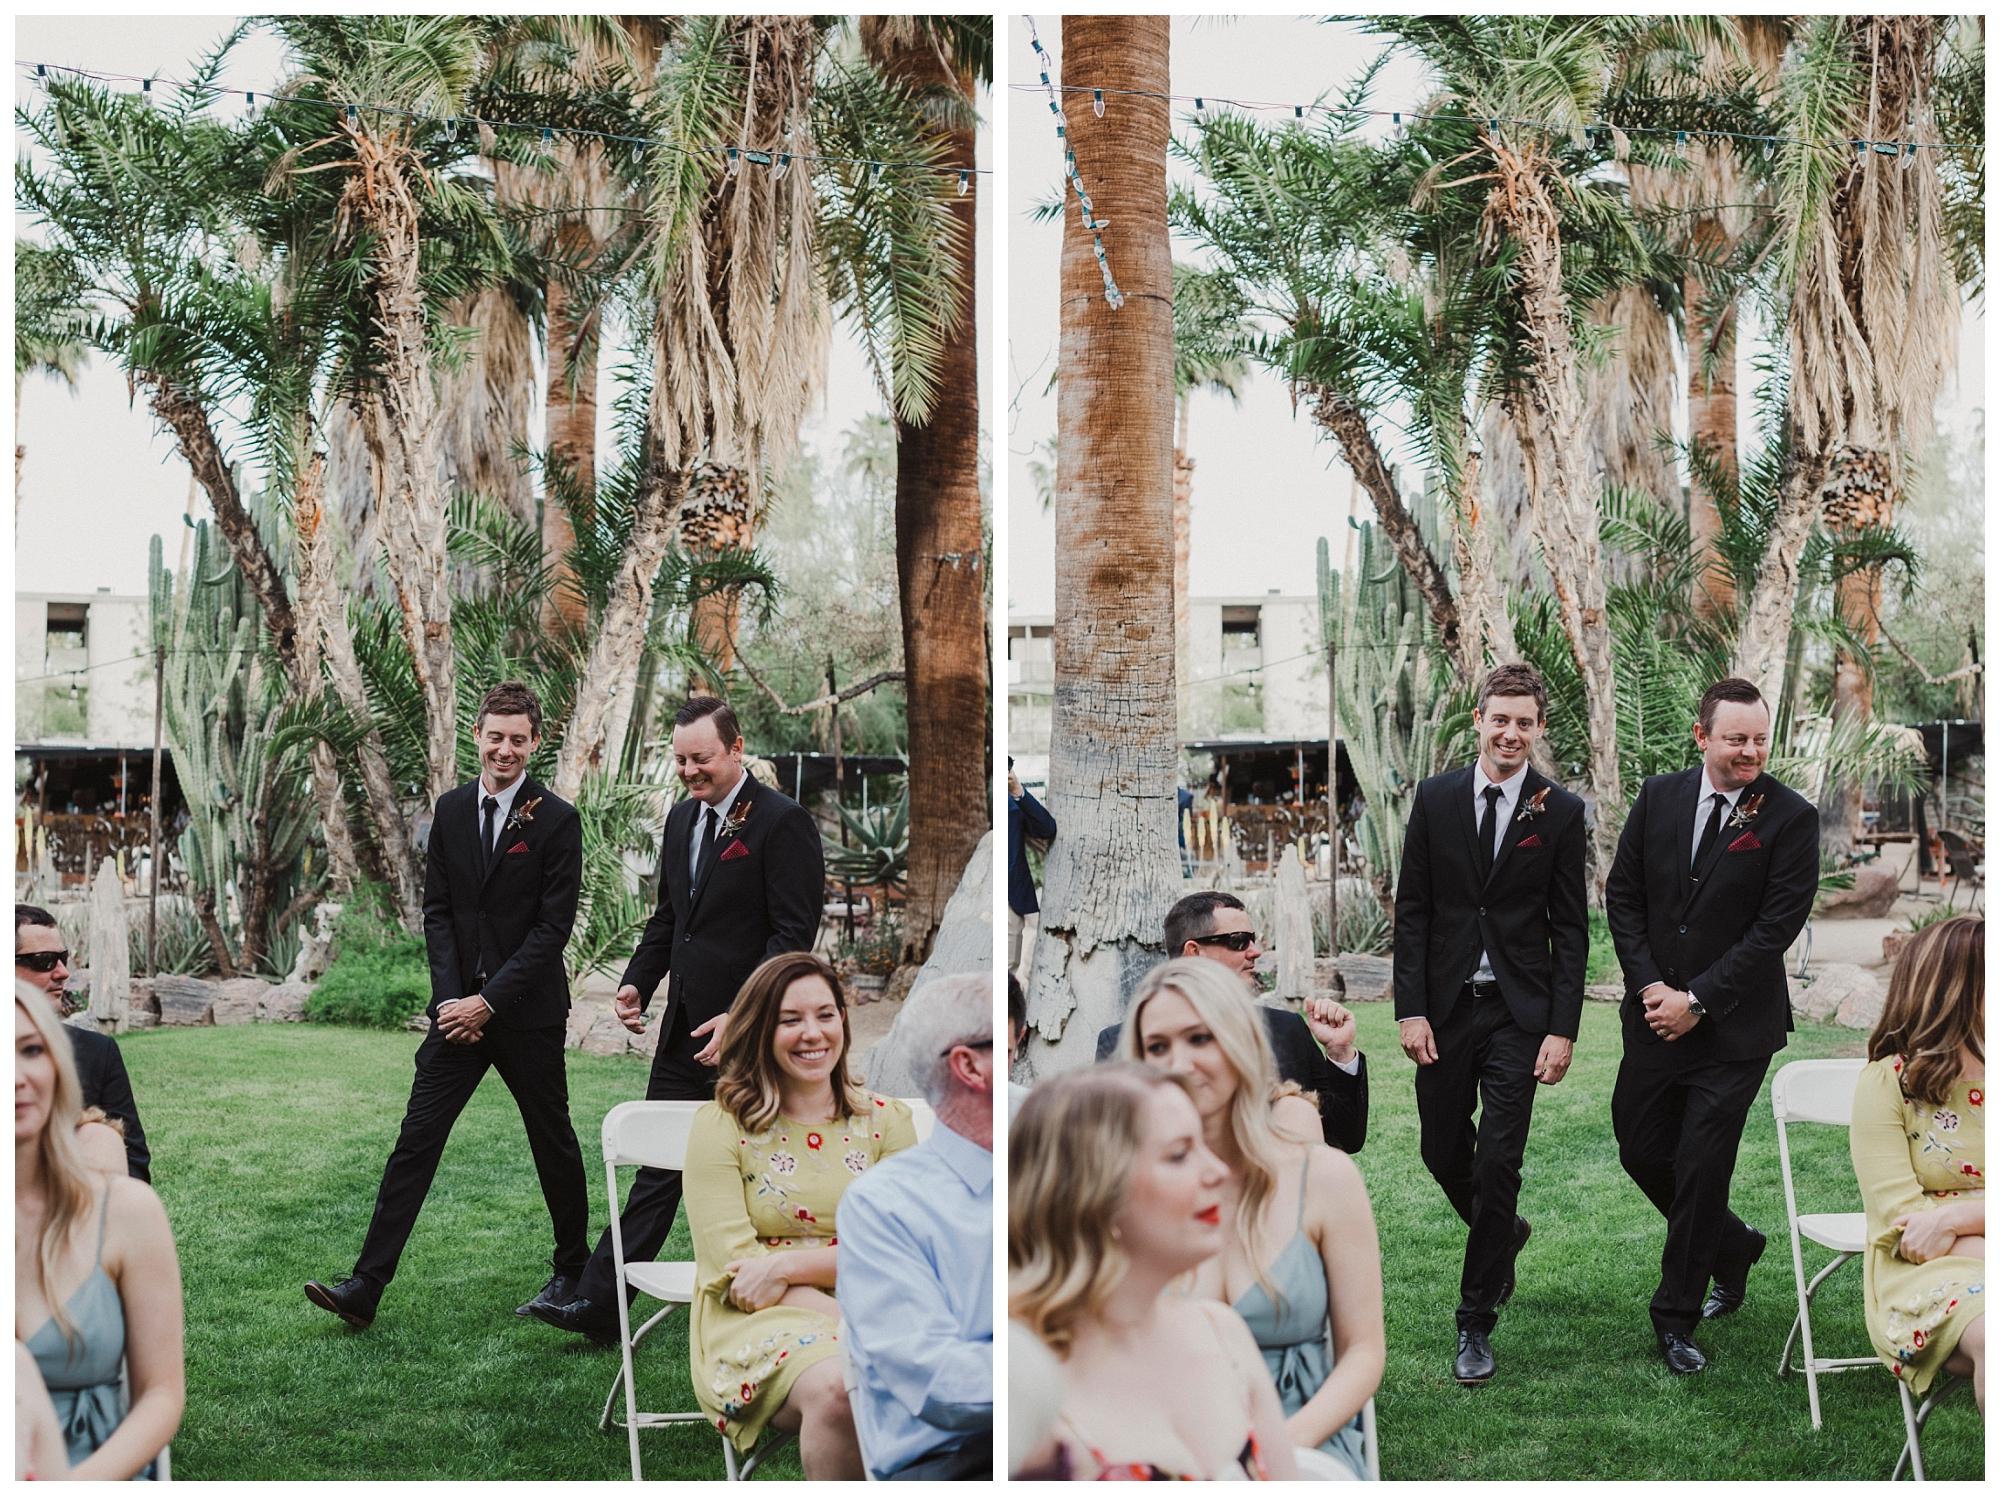 Ace Hotel Wedding Palm Springs (43).jpg